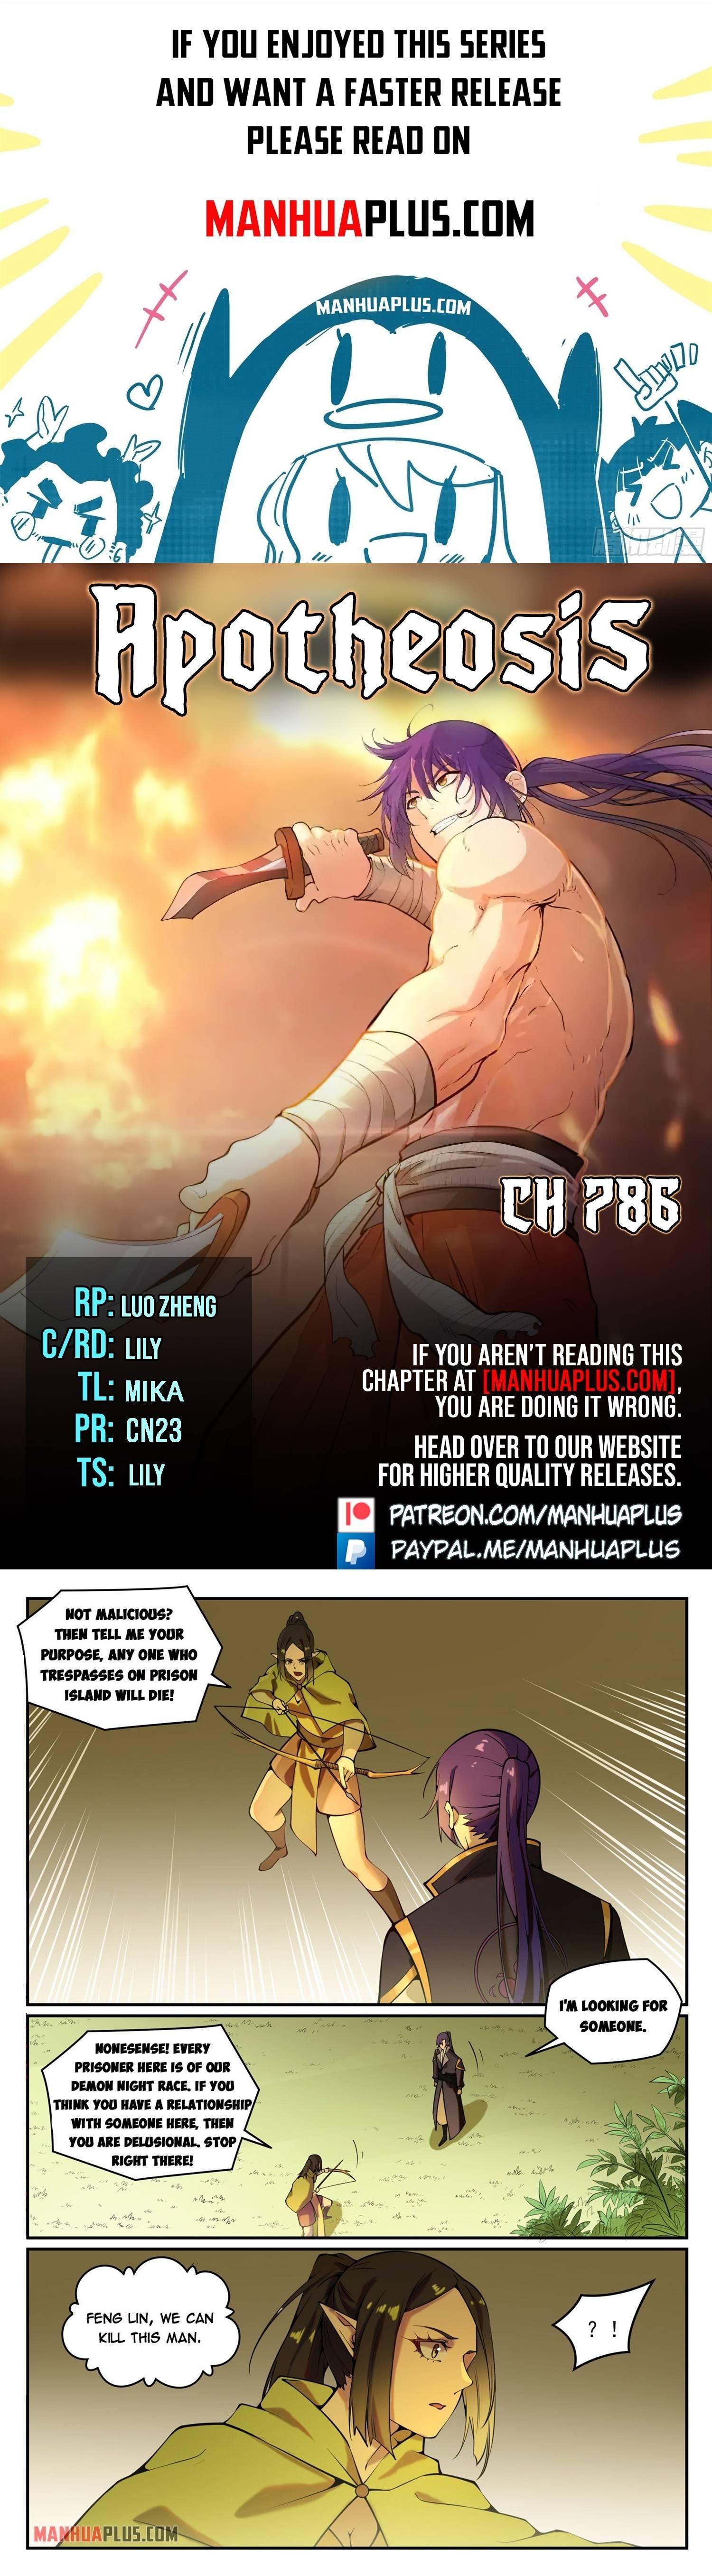 Manga Apotheosis - Chapter 786 Page 1